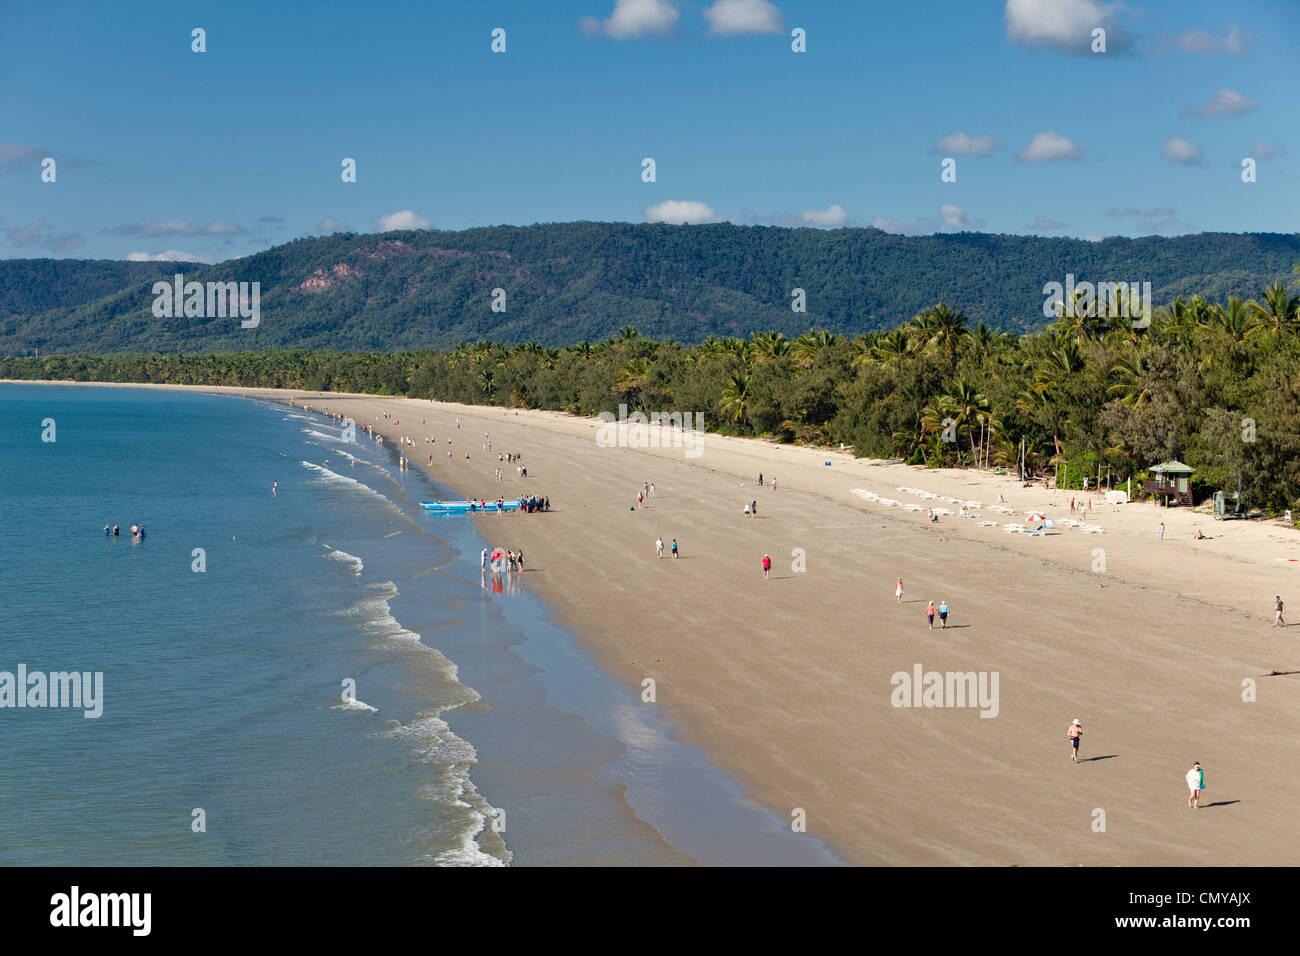 View along Four Mile Beach. Port Douglas, Queensland, Australia - Stock Image